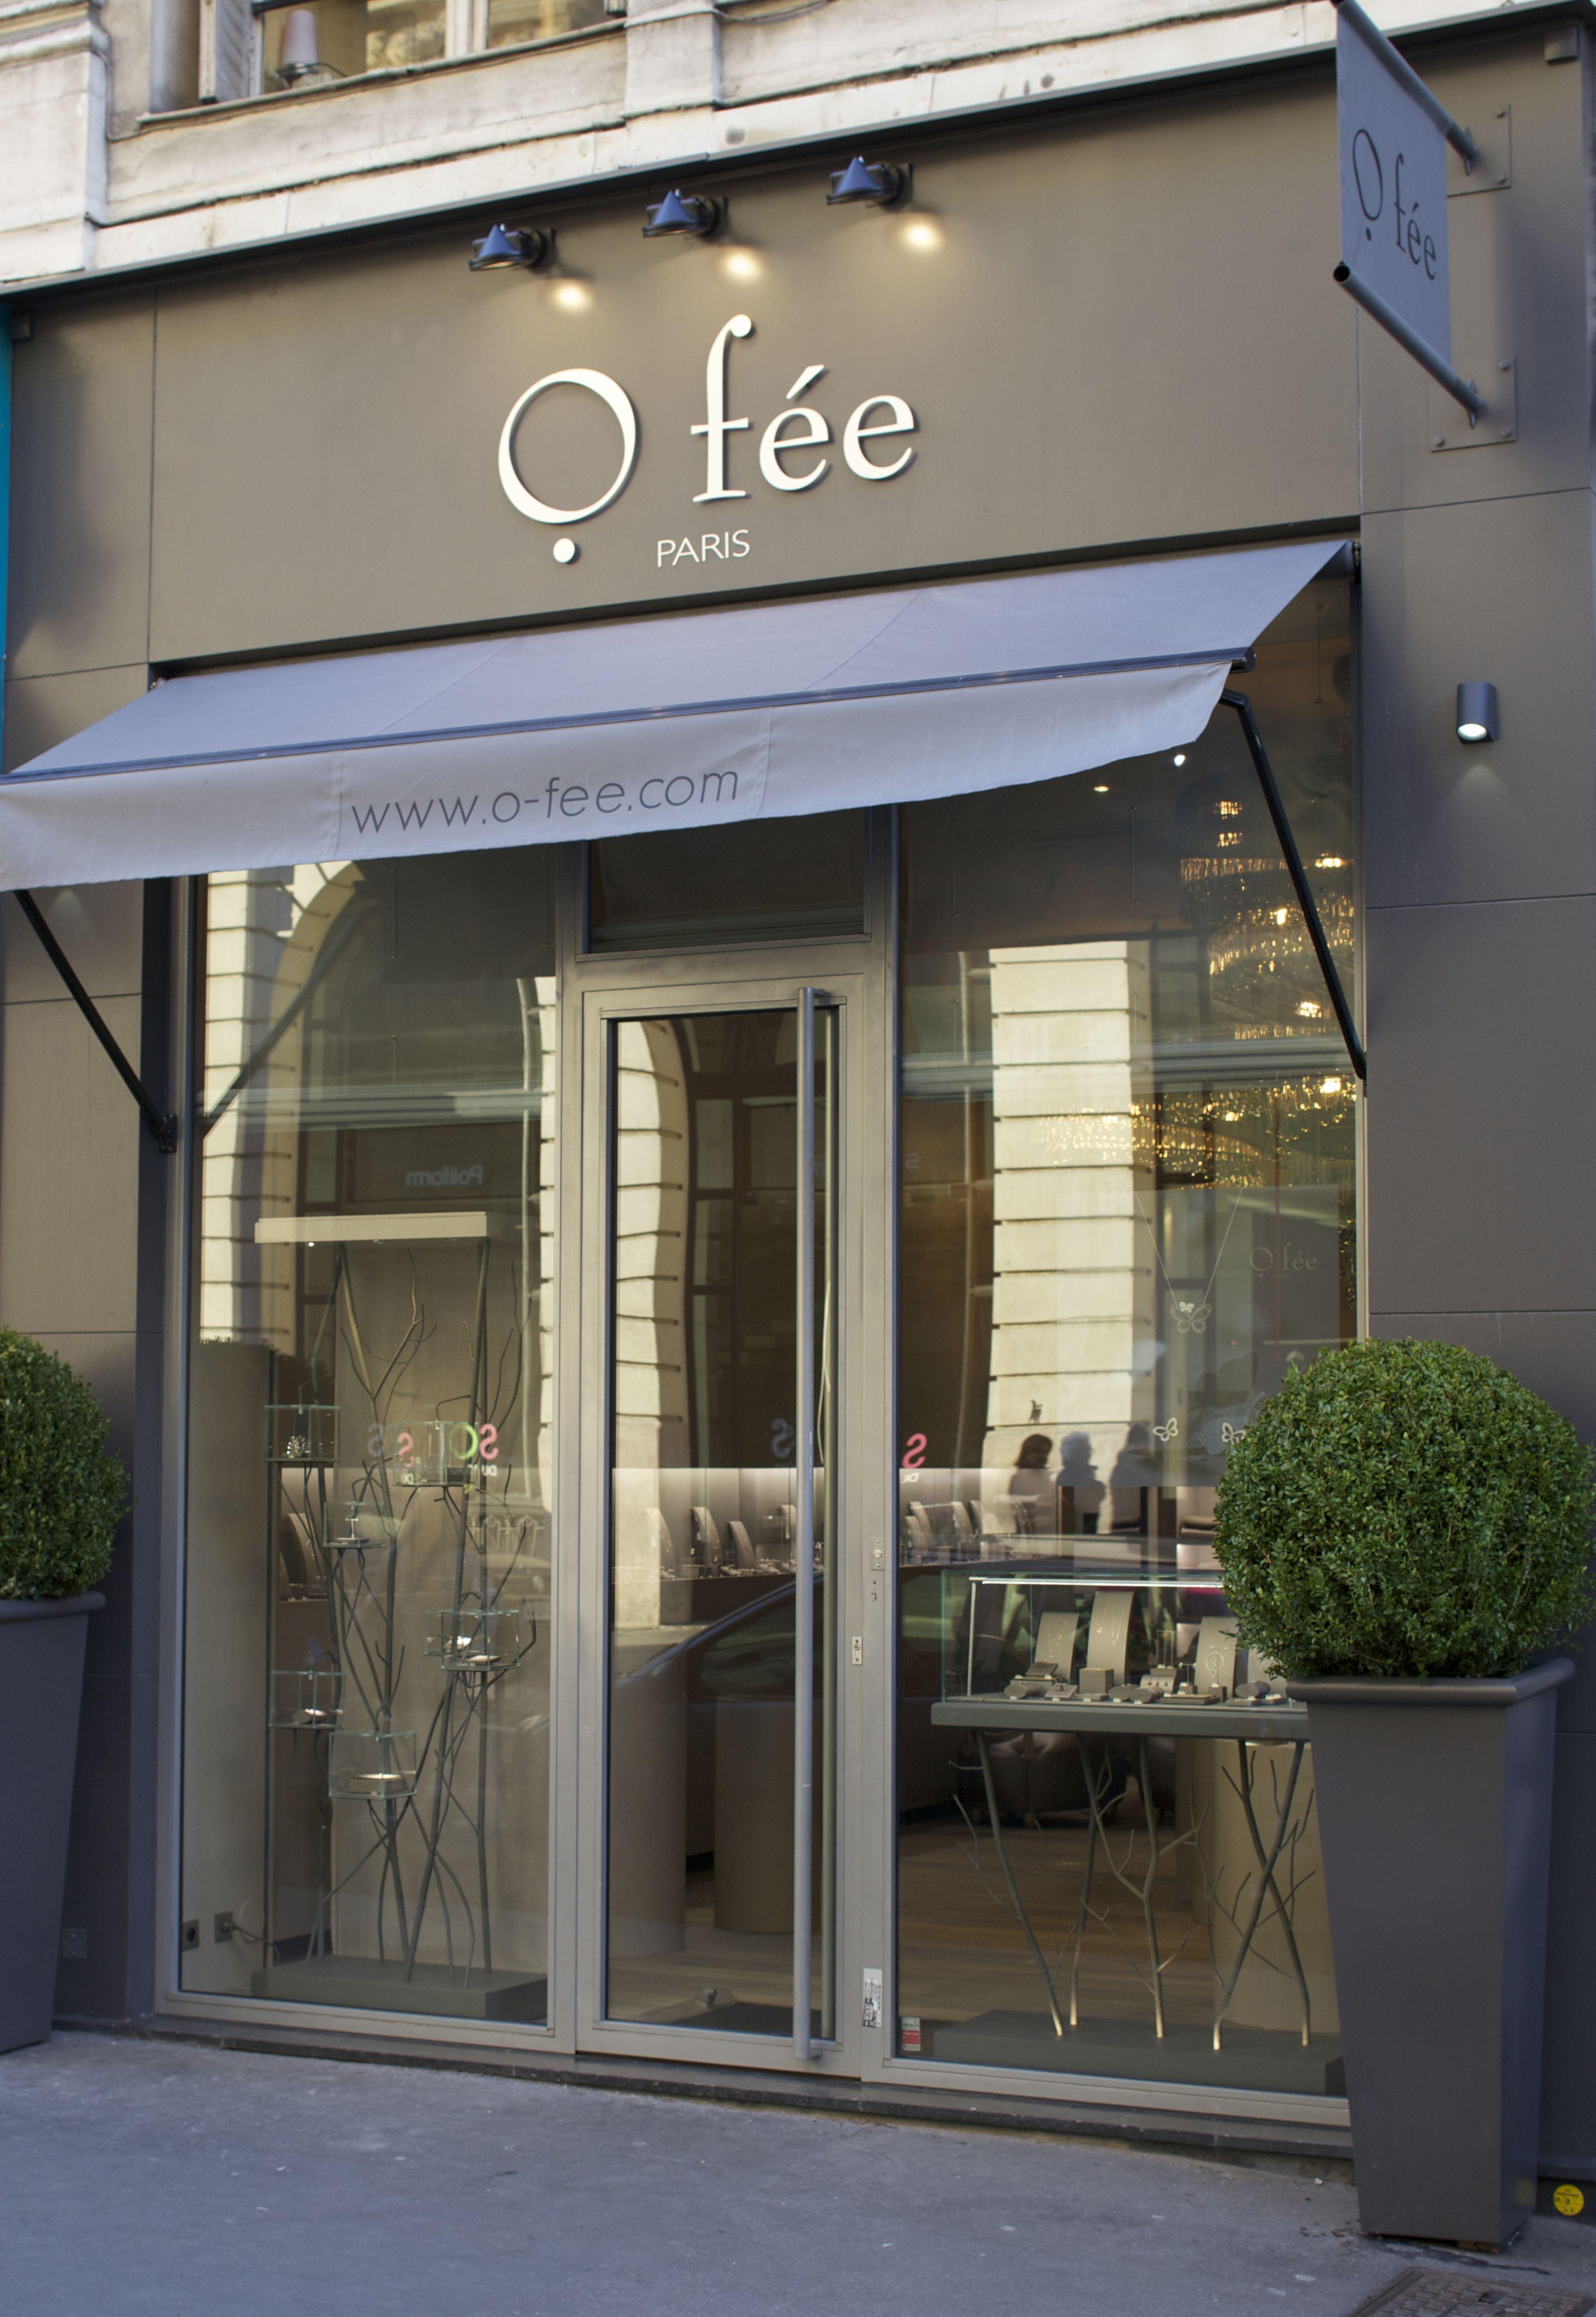 Les Ombres Restaurant at Musee de Quai Branly offers romantic